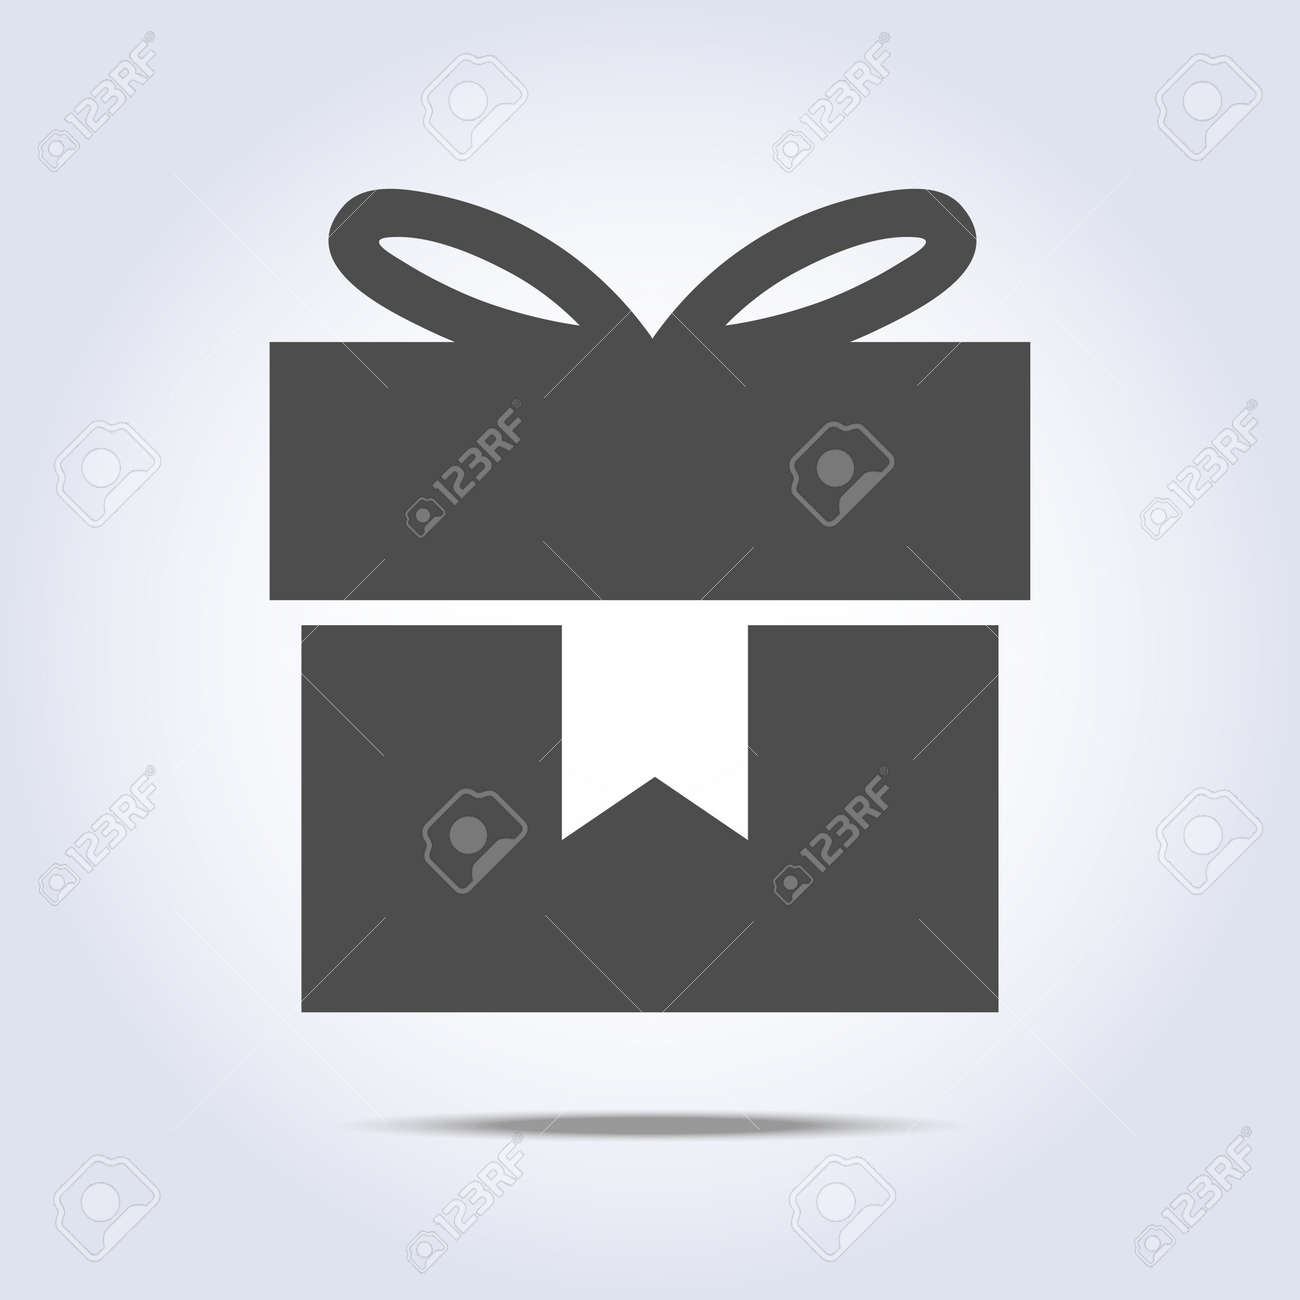 Gift icon. Stock Vector - 88177833